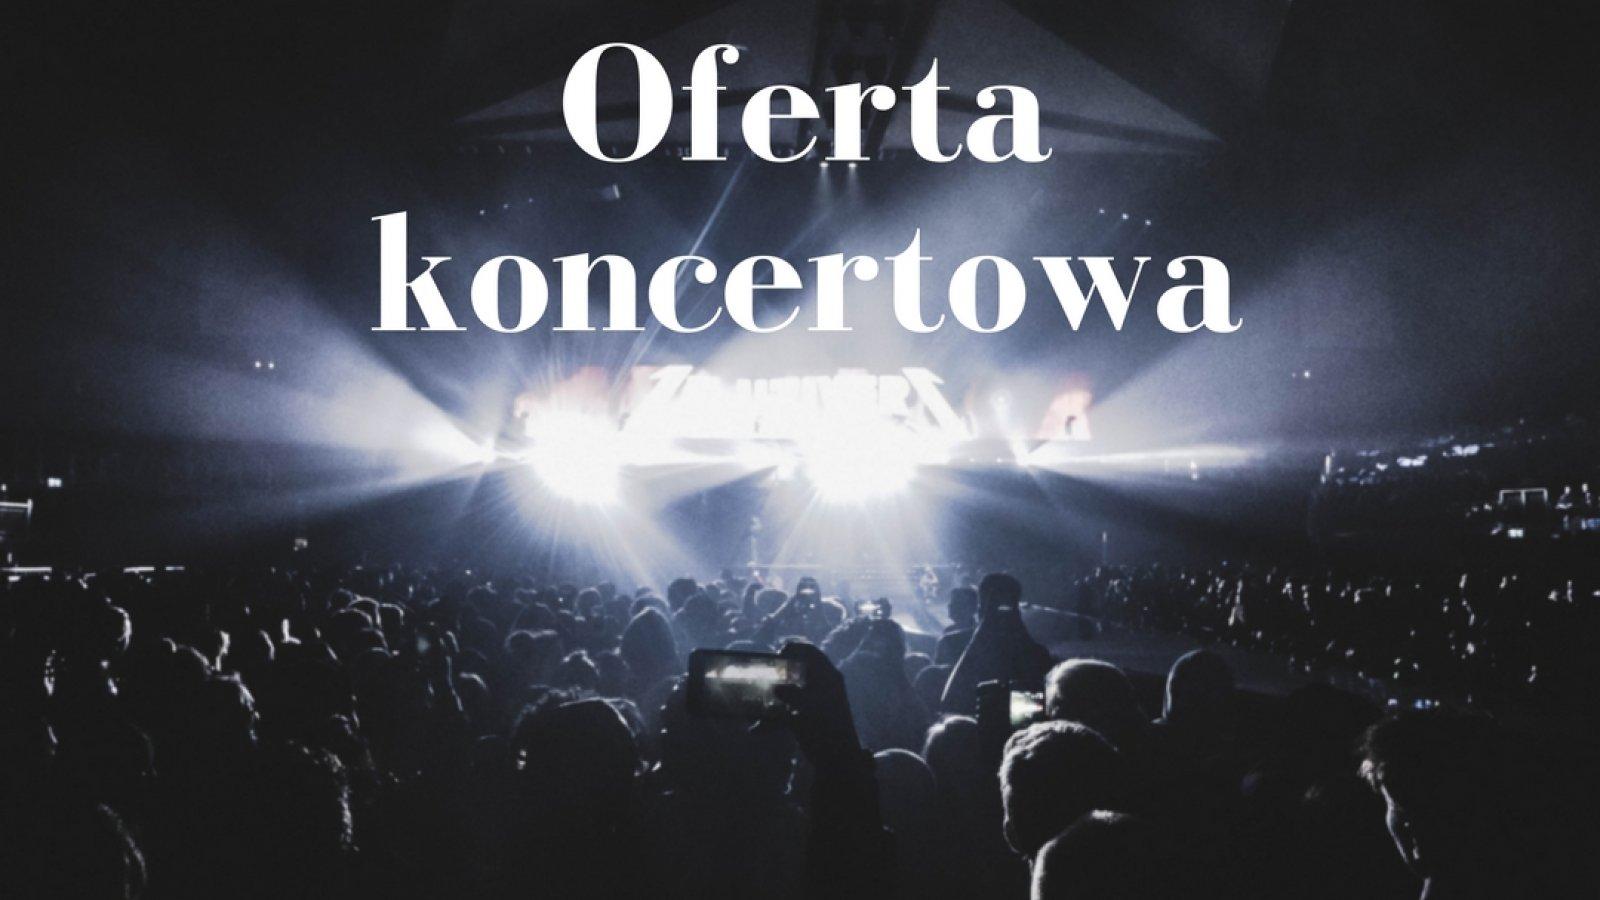 Oferta koncertowa